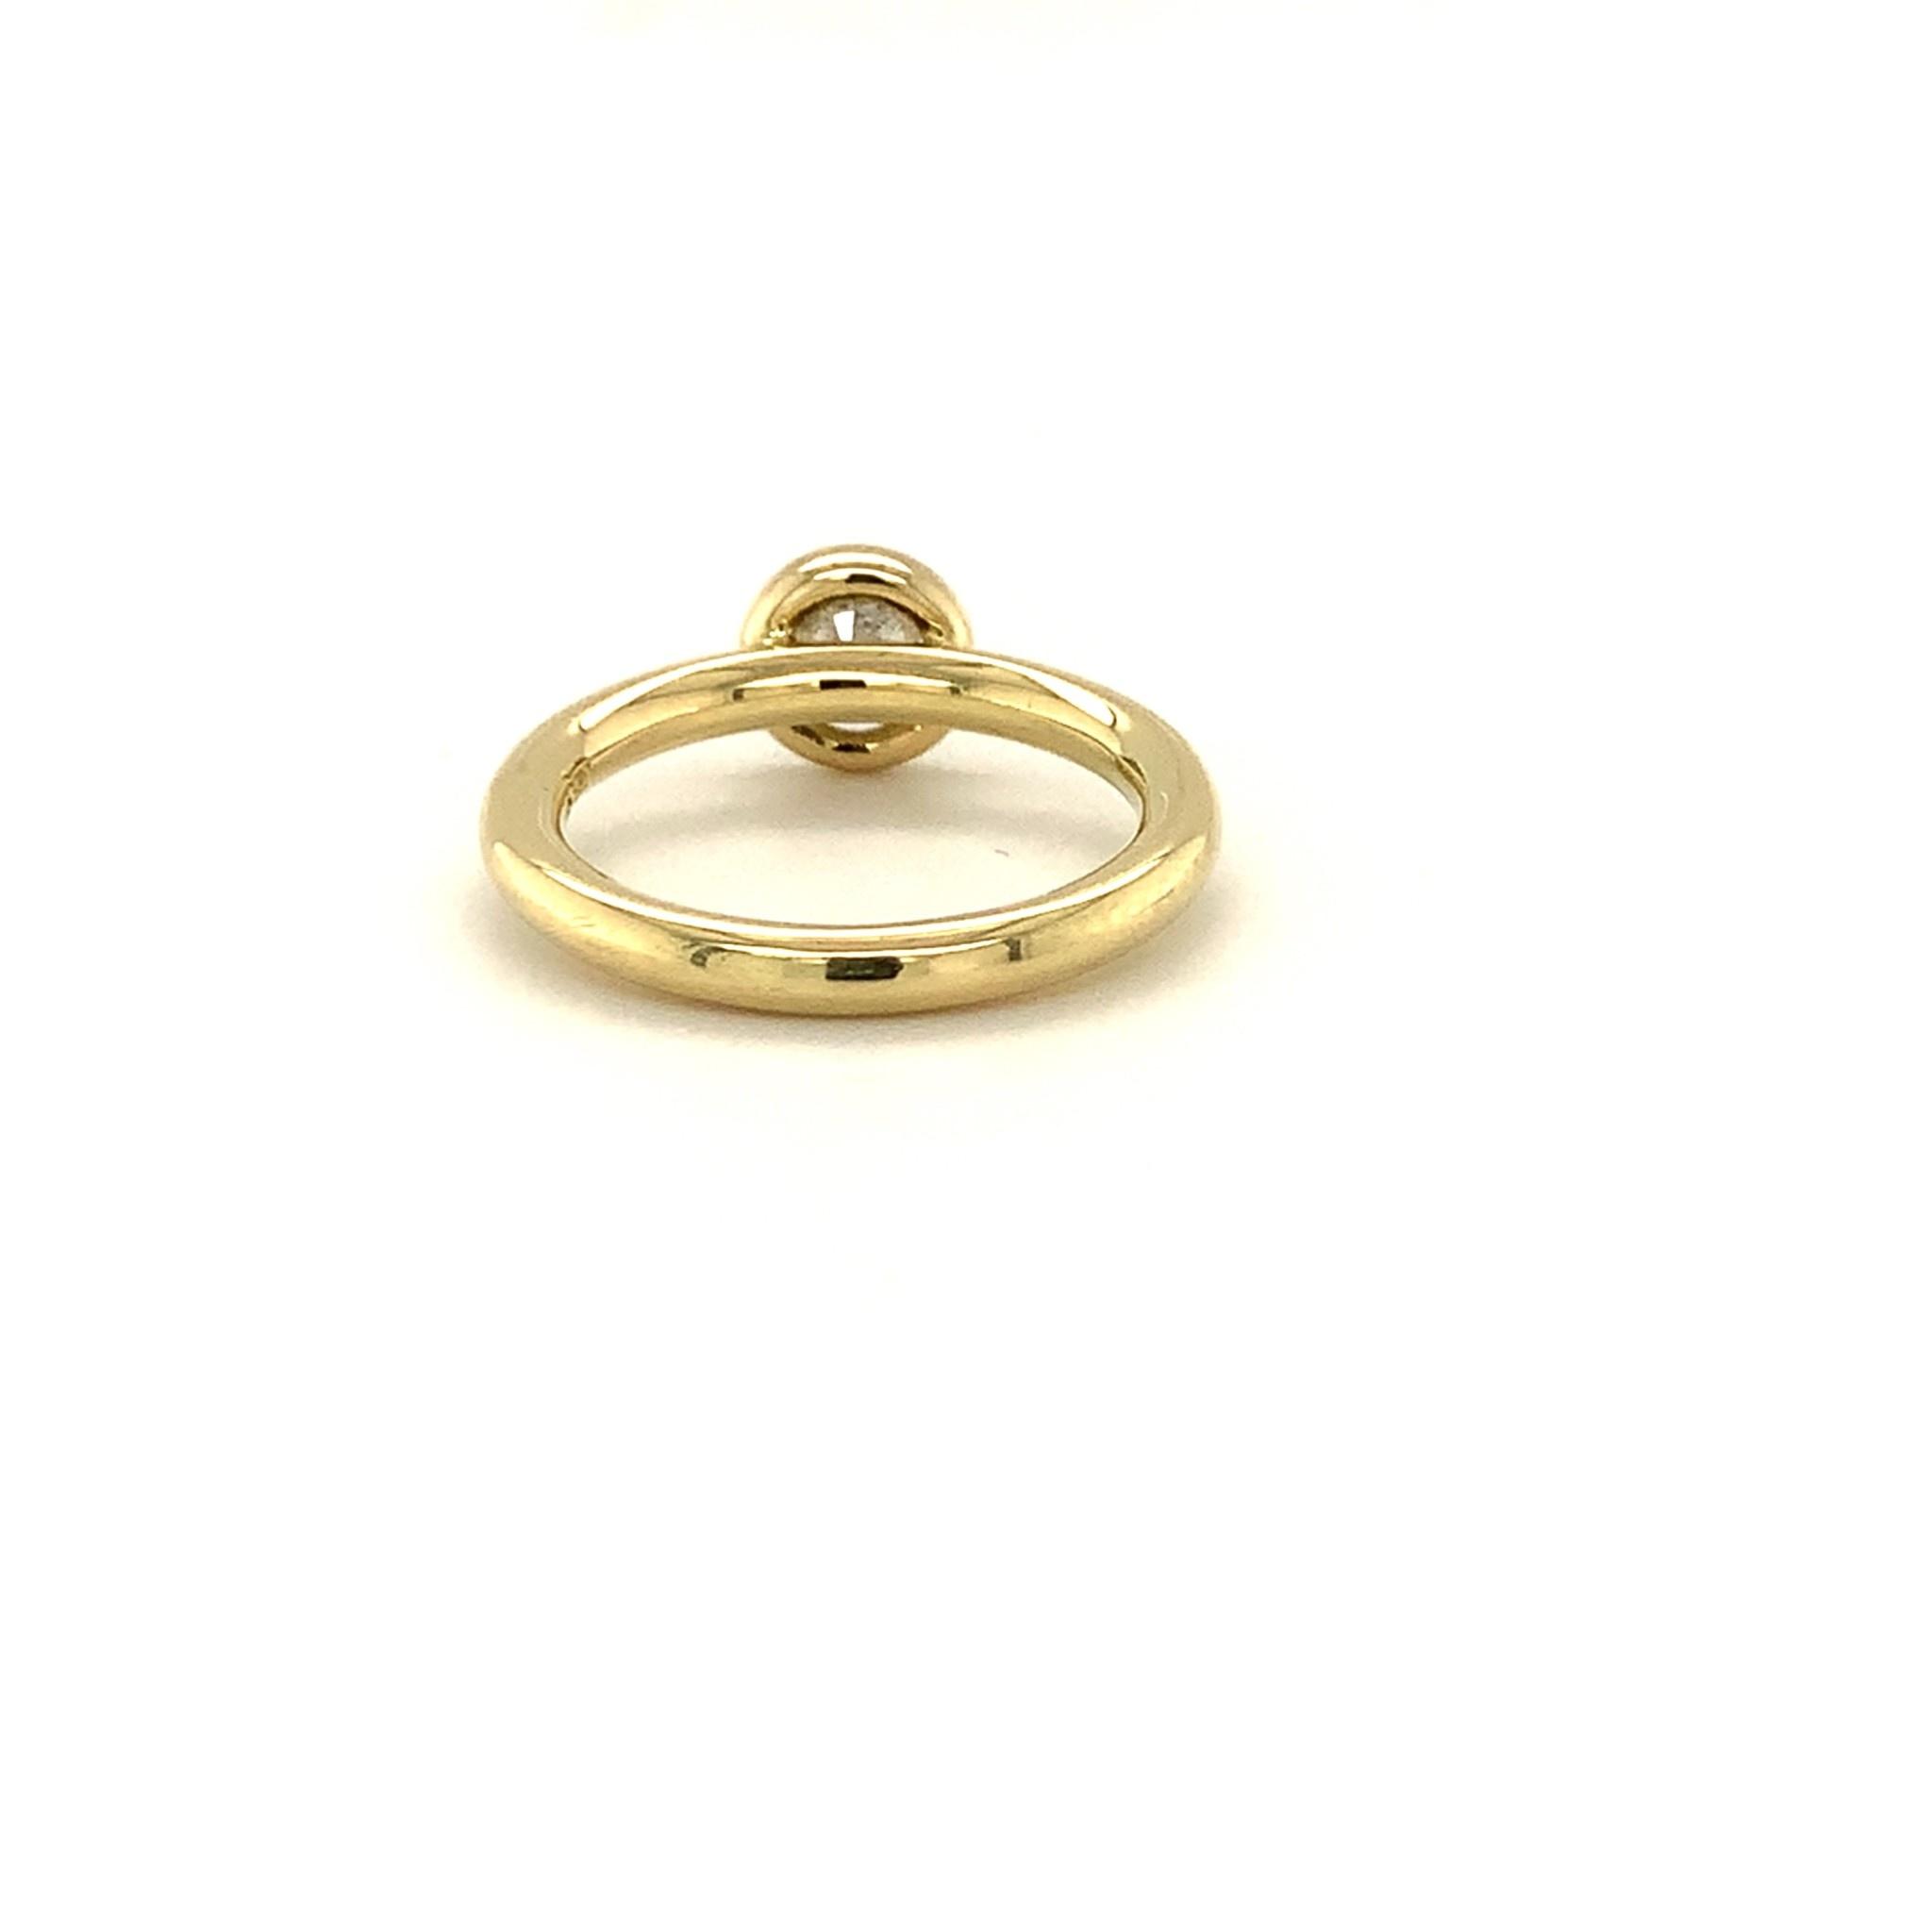 ROEMER by Bregje ROEMER by Bregje geelgouden ring met briljant 1.03ct